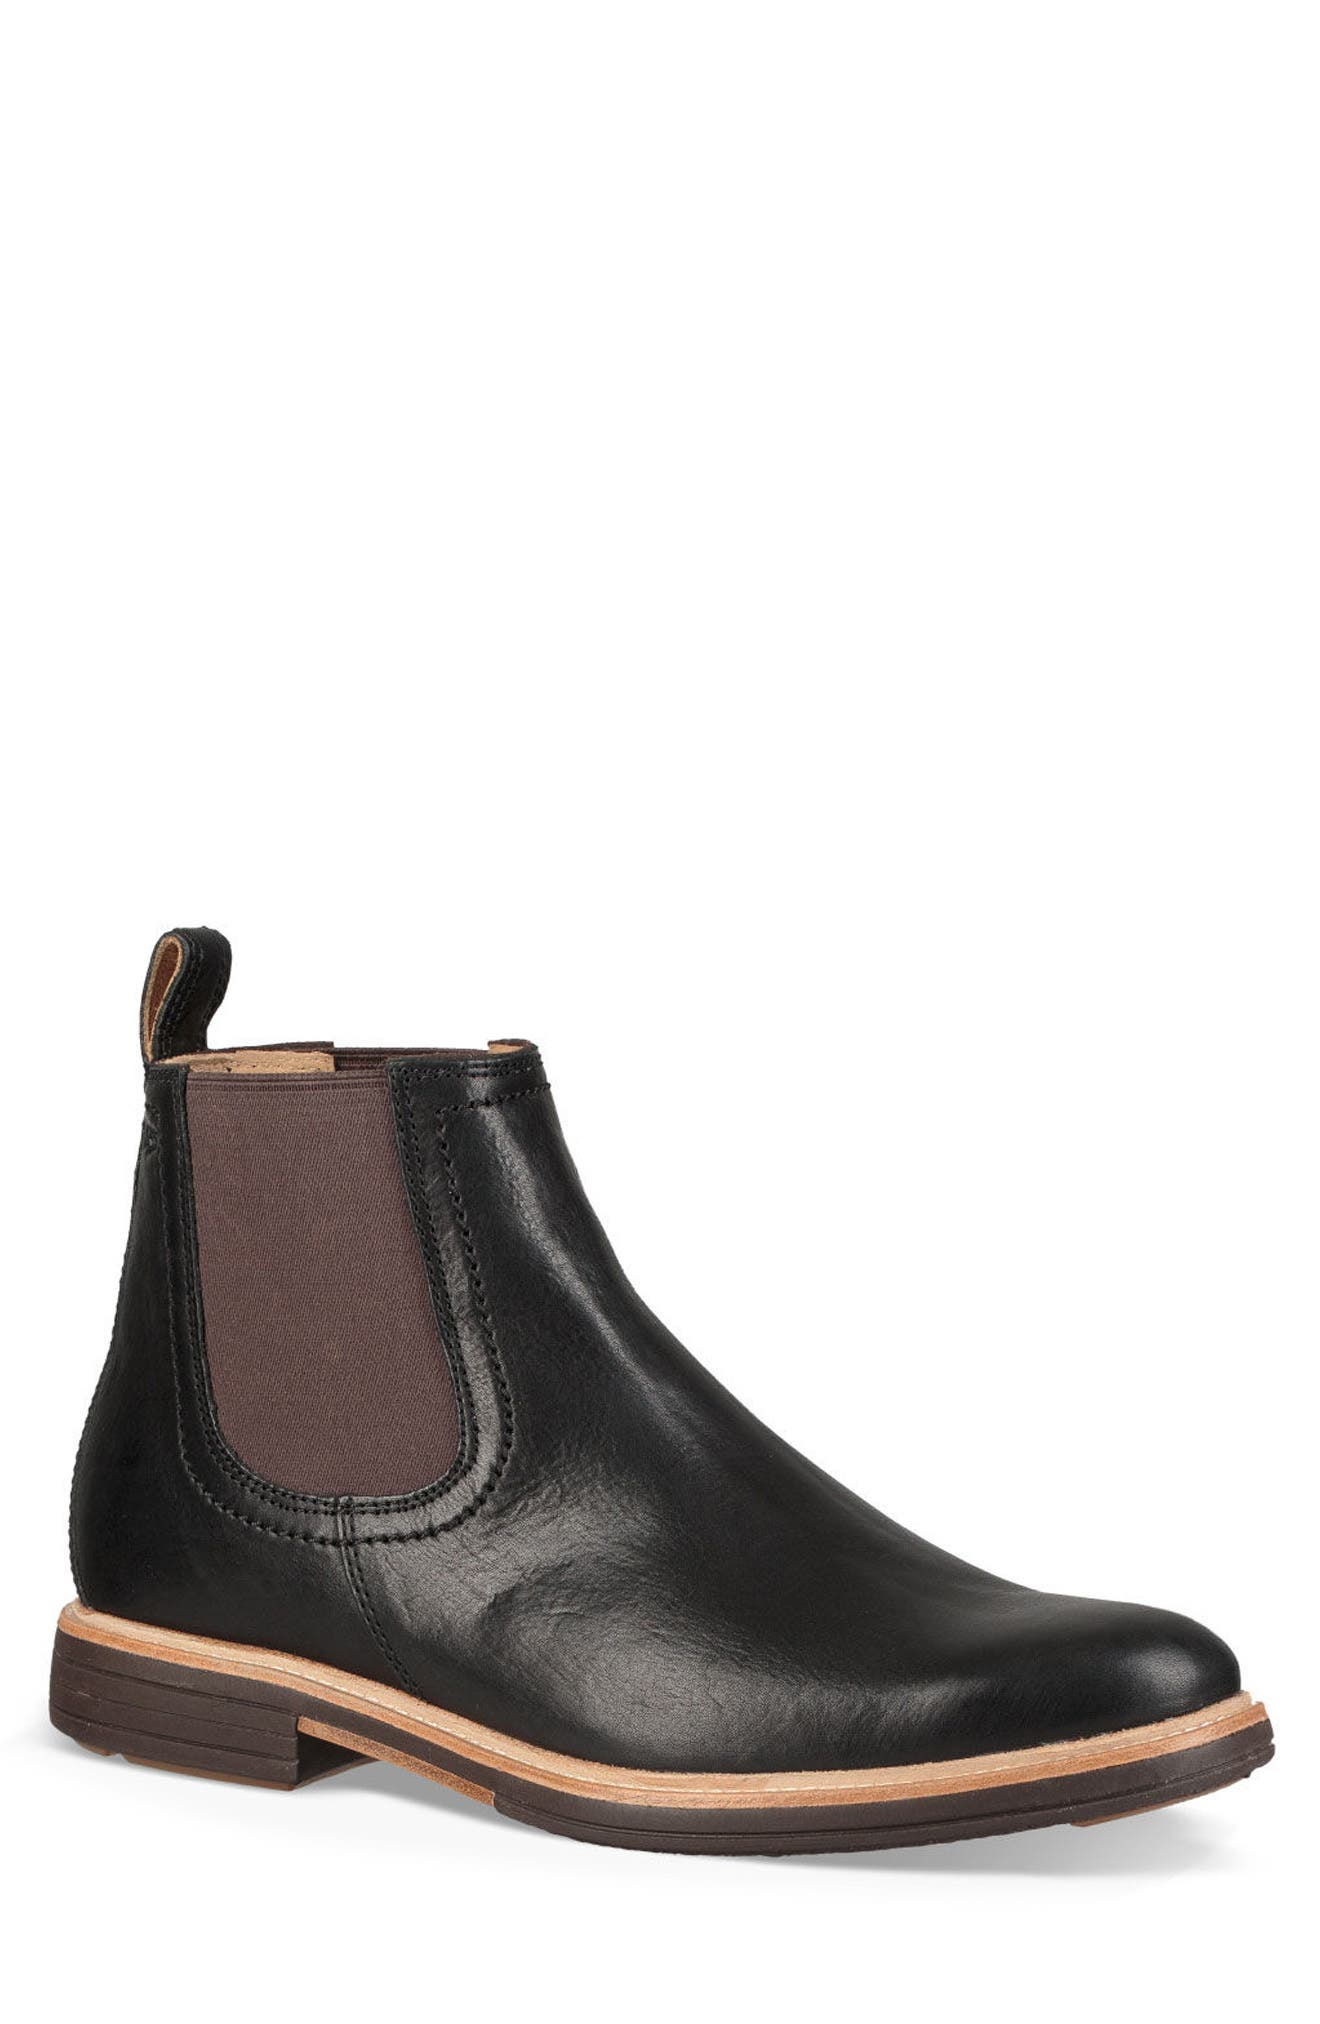 Baldvin Chelsea Boot,                         Main,                         color, BLACK LEATHER/SUEDE